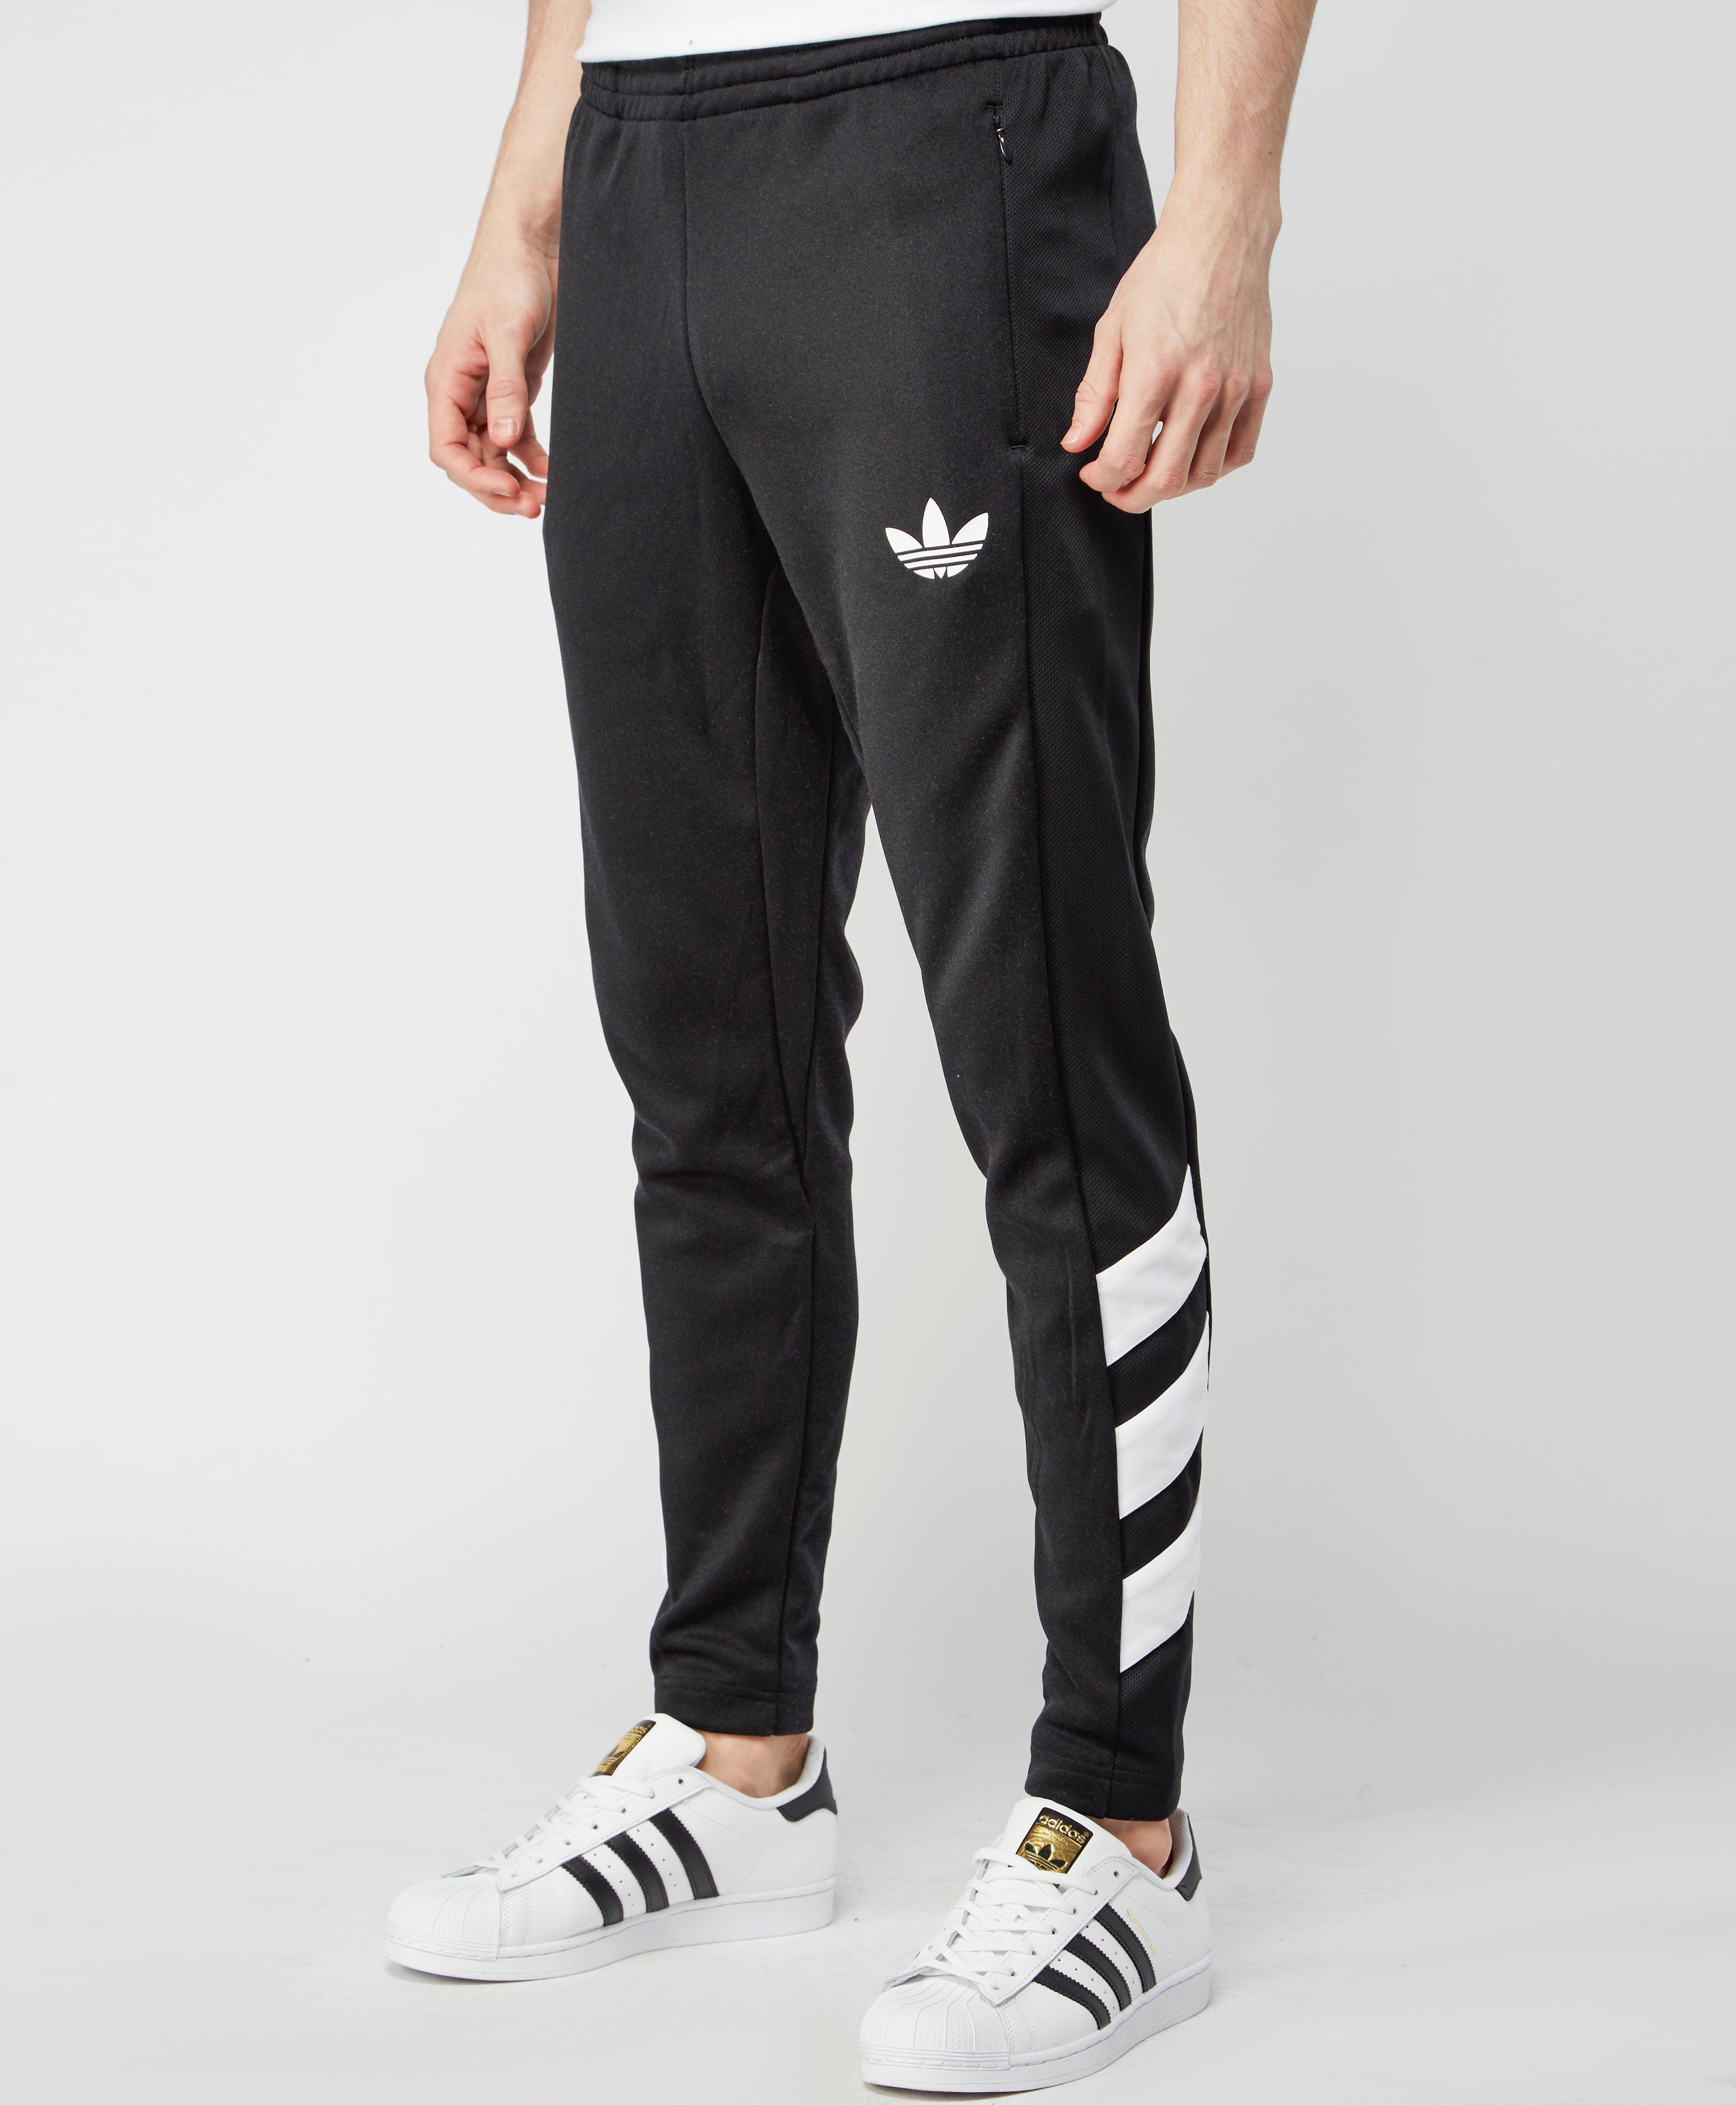 Lyst Adidas Originals Trefoil Football Club Poly Pants